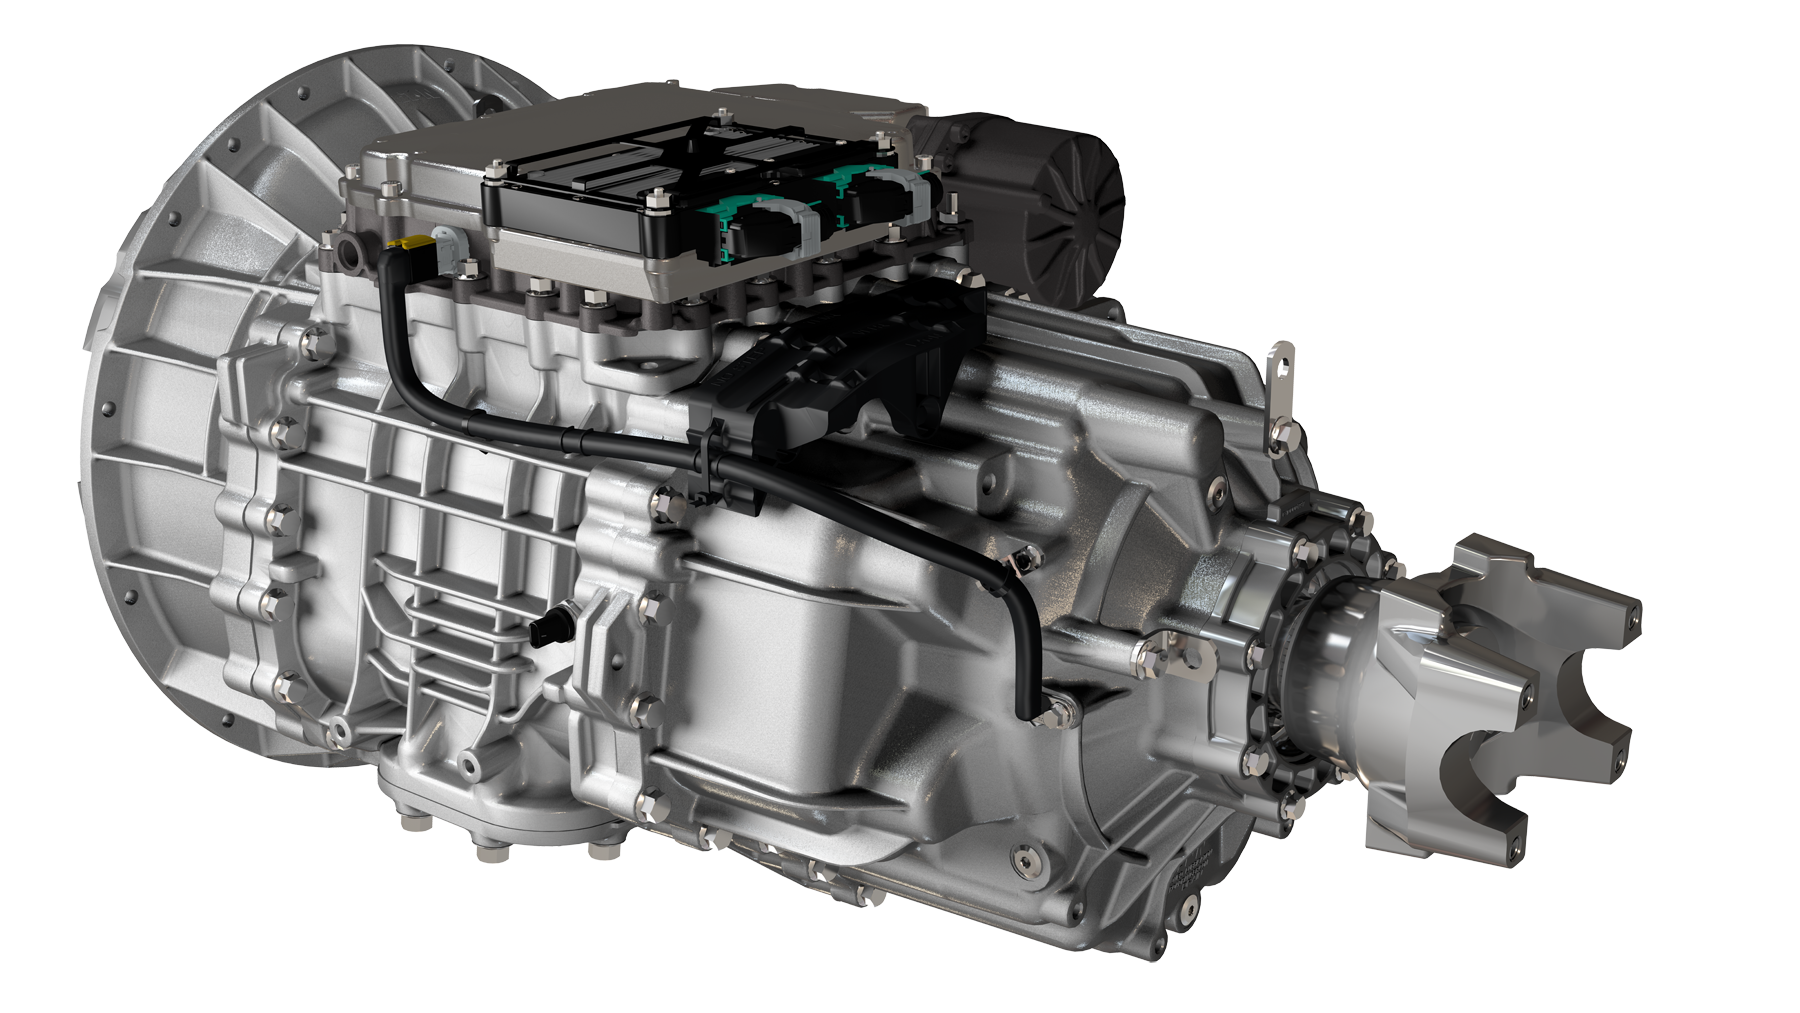 Eaton Cummins Endurant 12-speed automated manual transmission